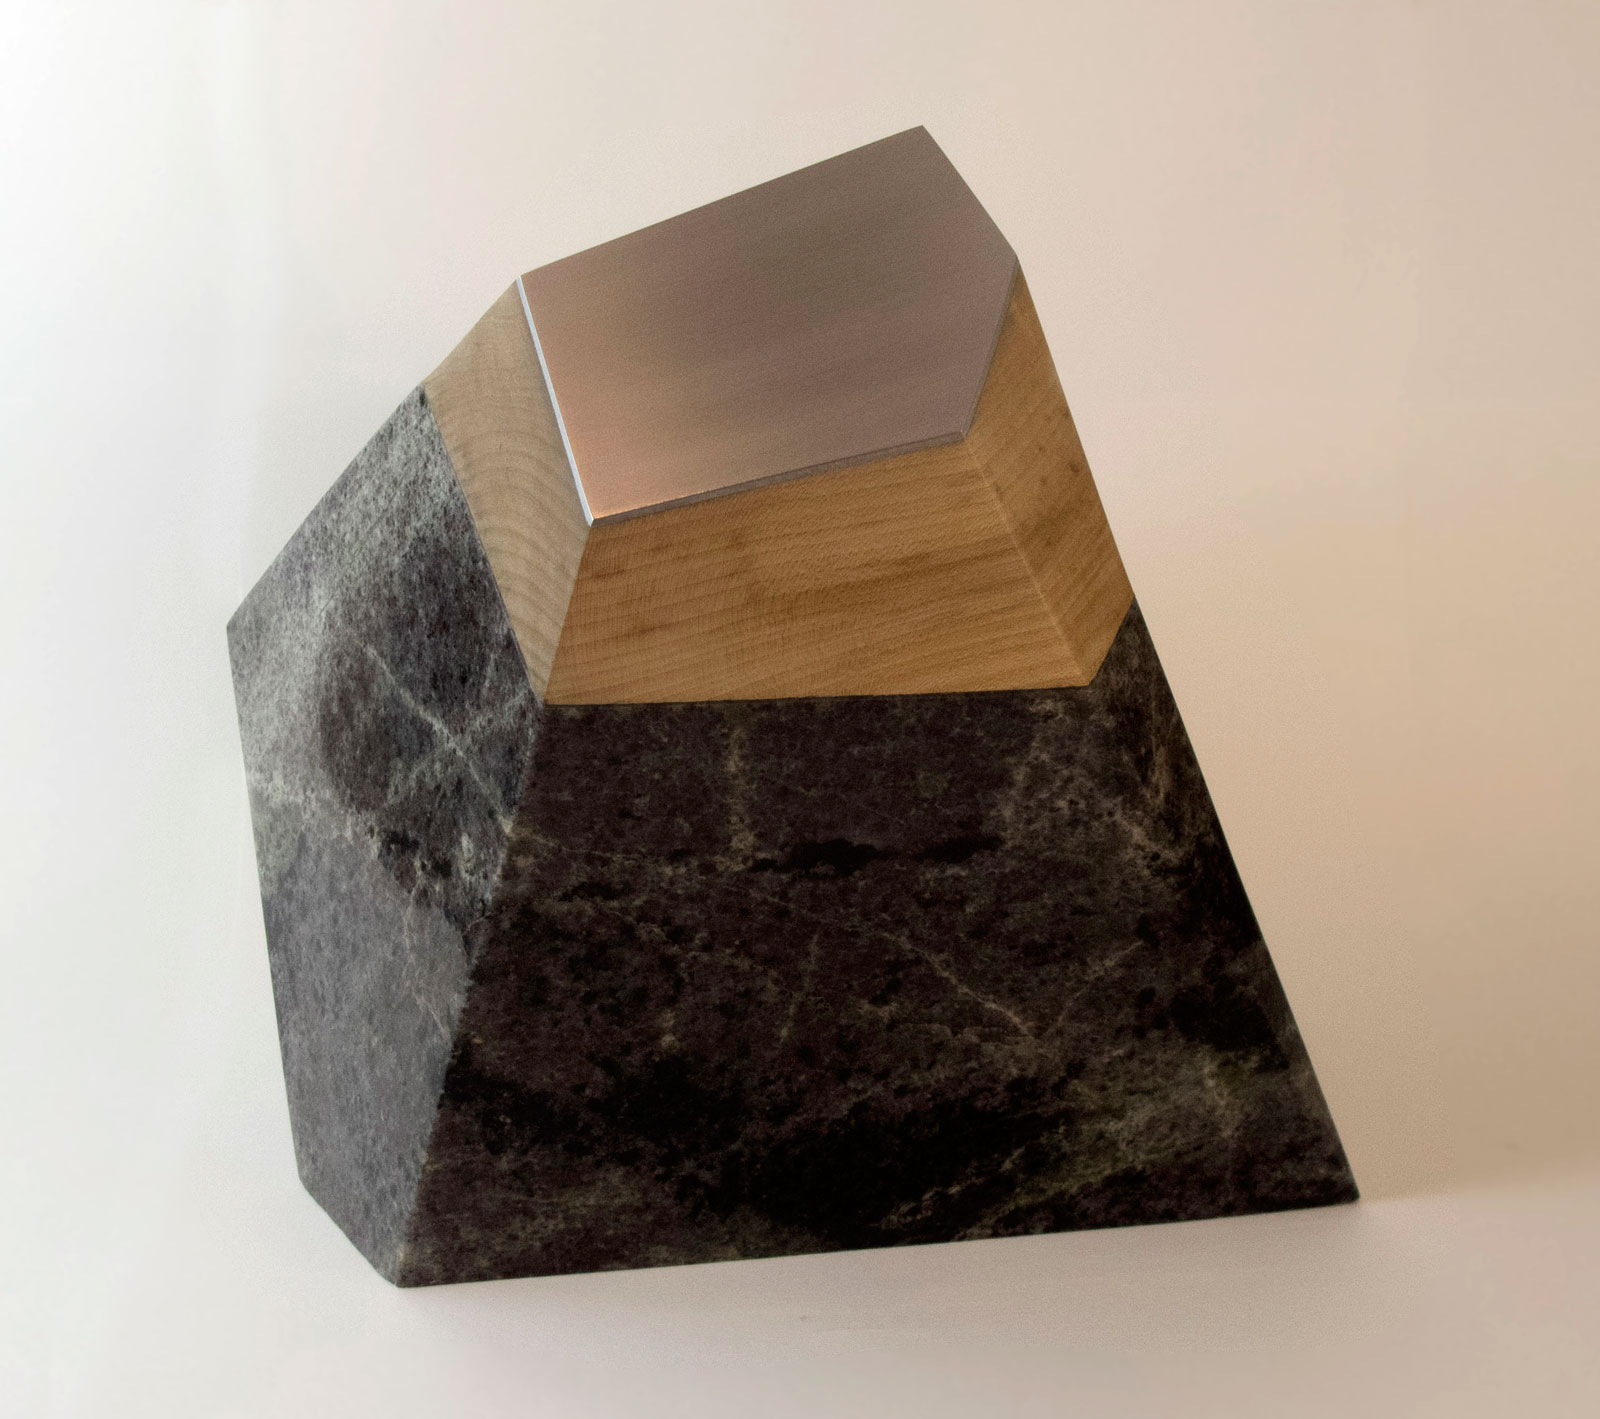 Fragmented Earth II - 2017, Lewisian gneiss, hardwood and aluminium, 30 x 40 x 34 - 35kg. £1950